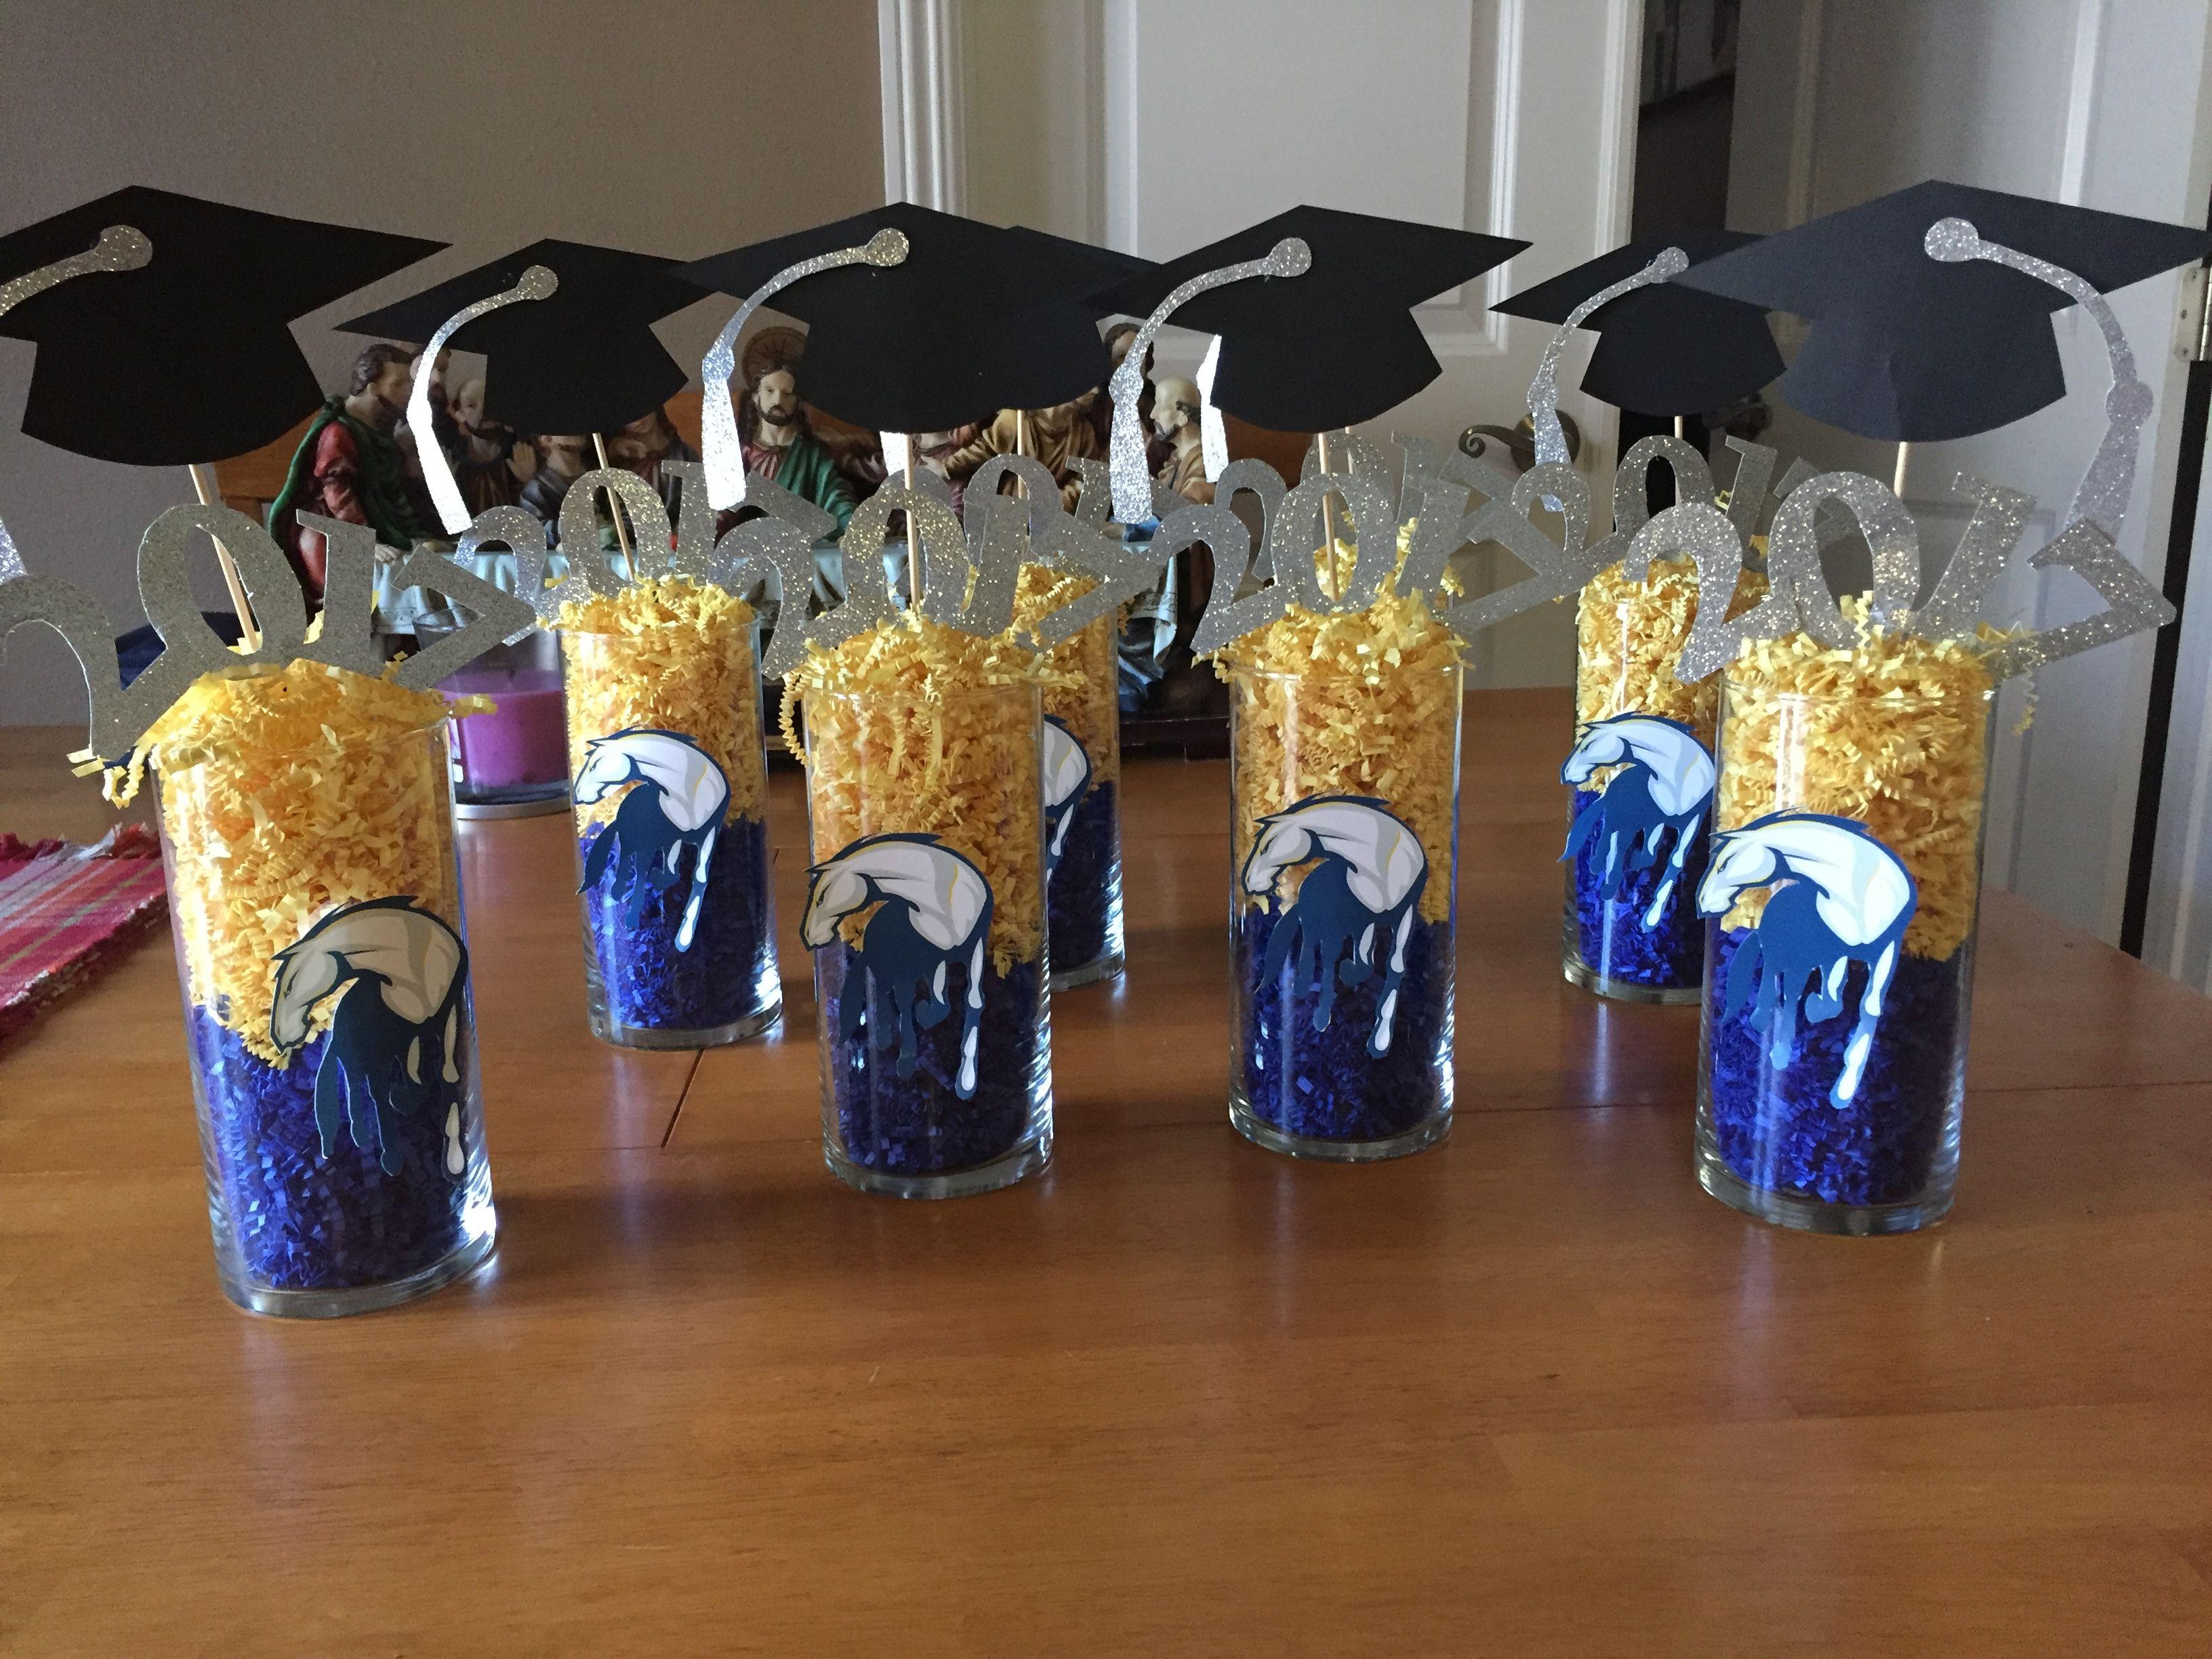 Uc Davis Graduation Centerpieces Graduation Party Centerpieces Graduation Party Decor Graduation Party Inspiration